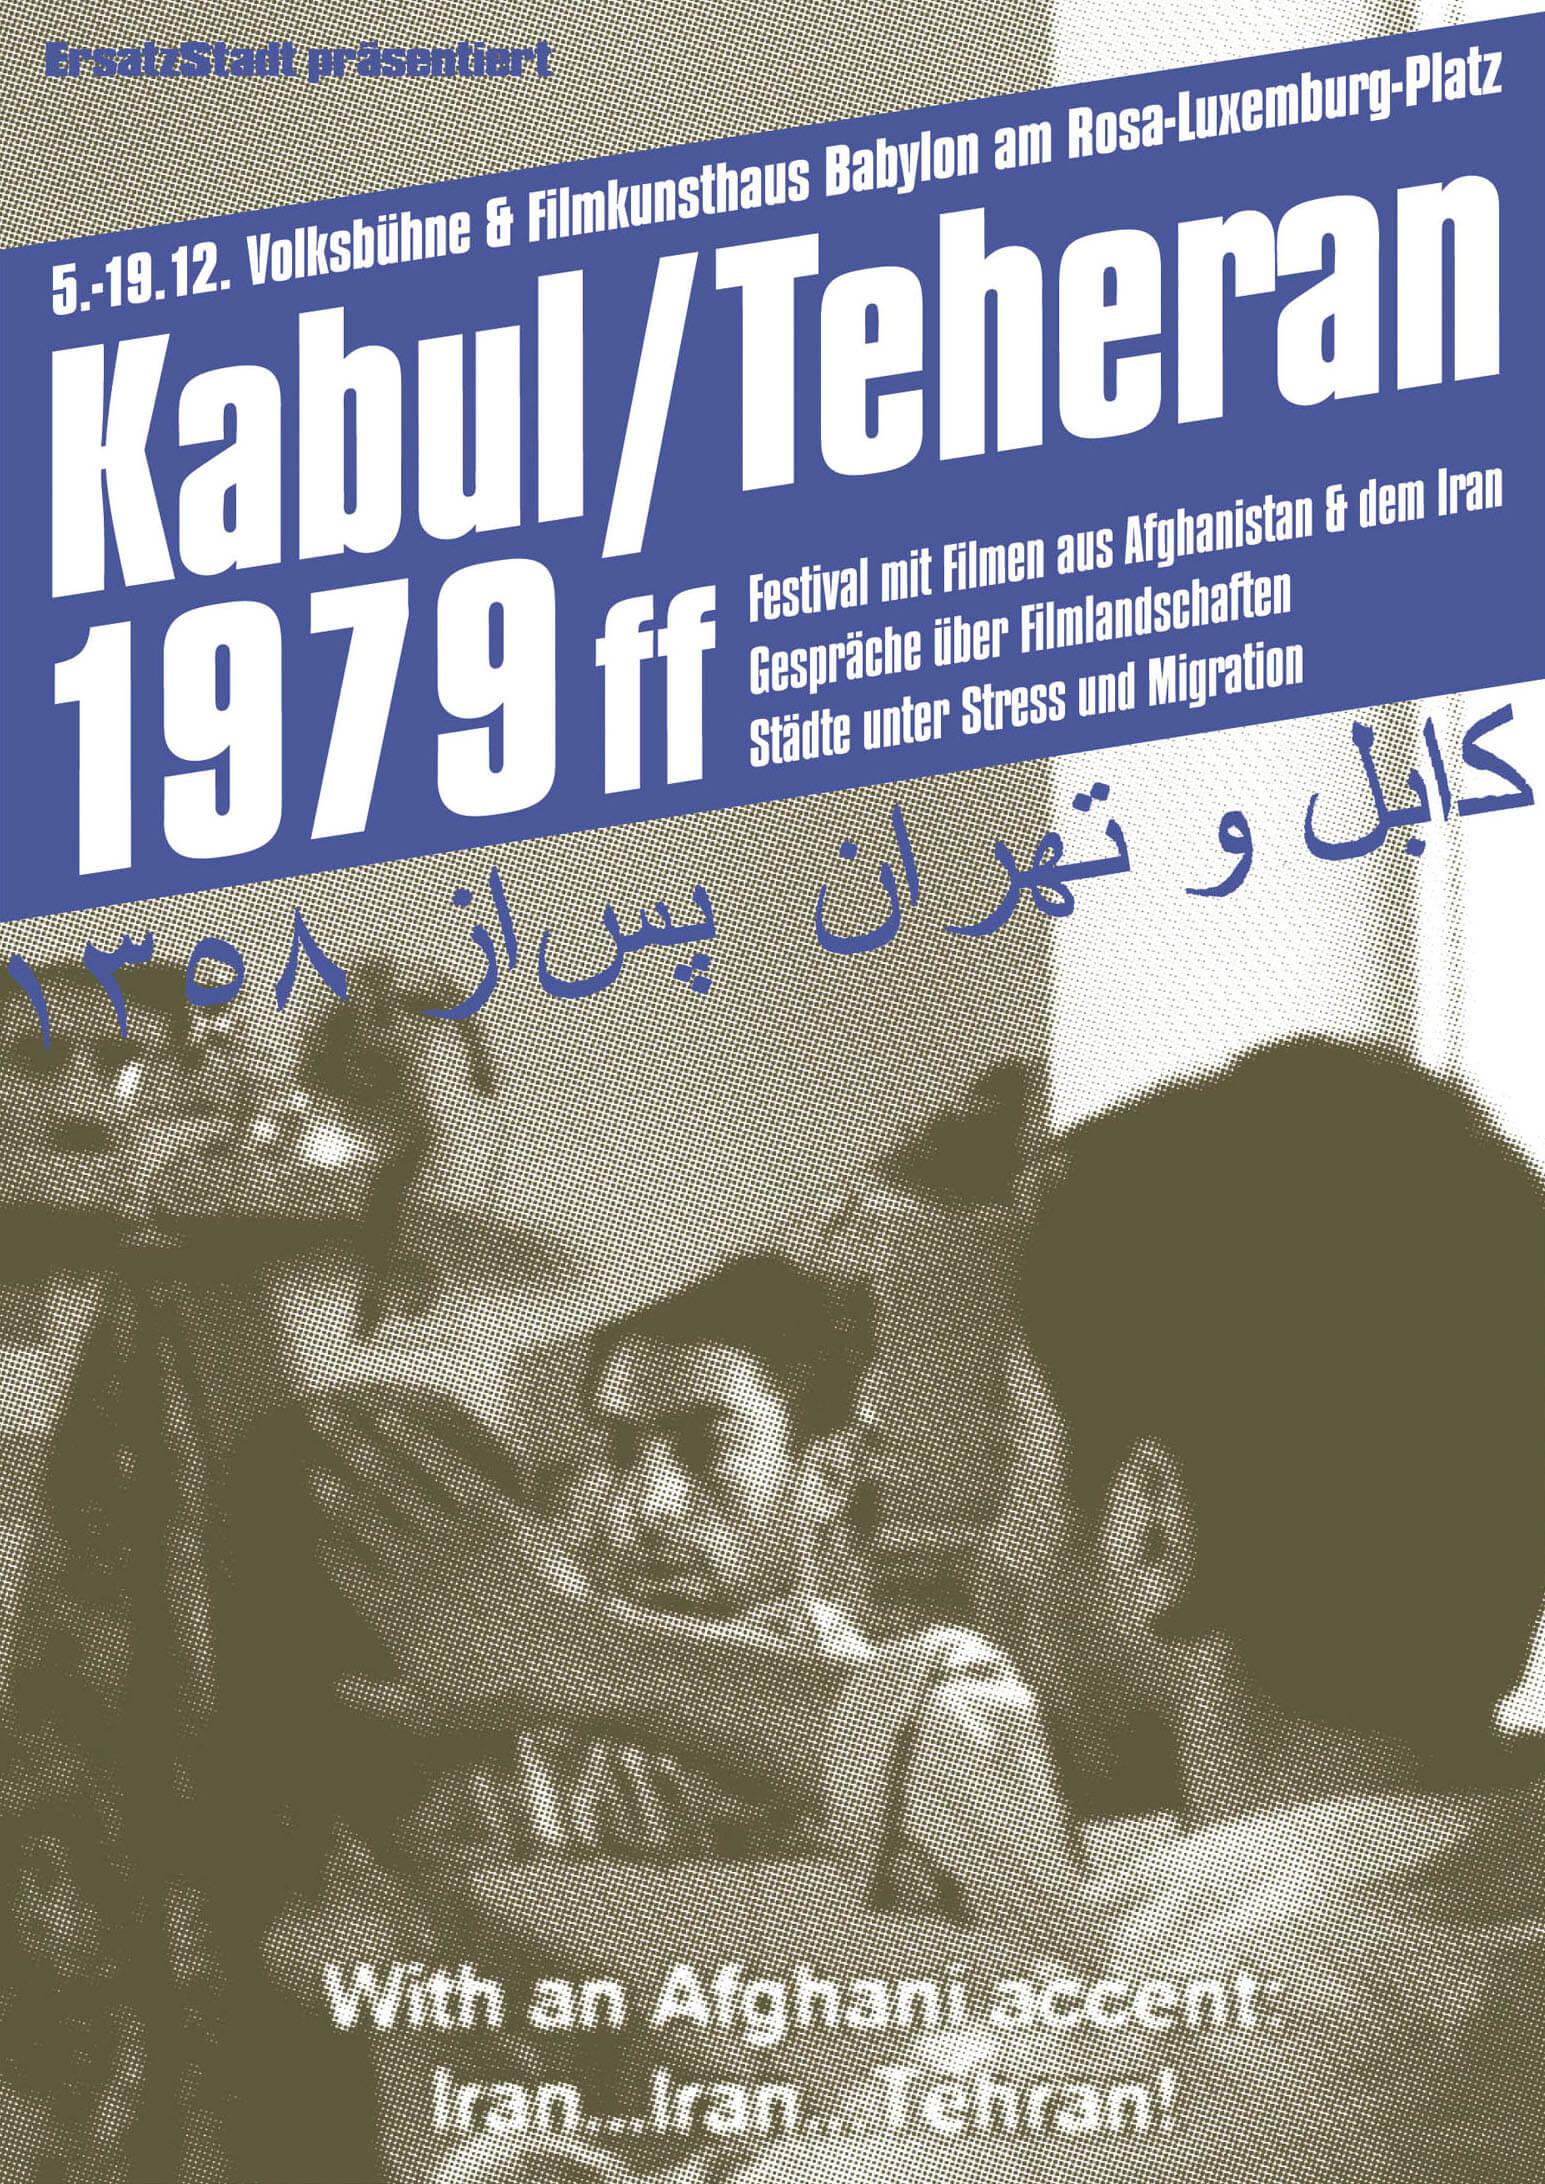 Kabul/Teheran – mazefilm-2 0